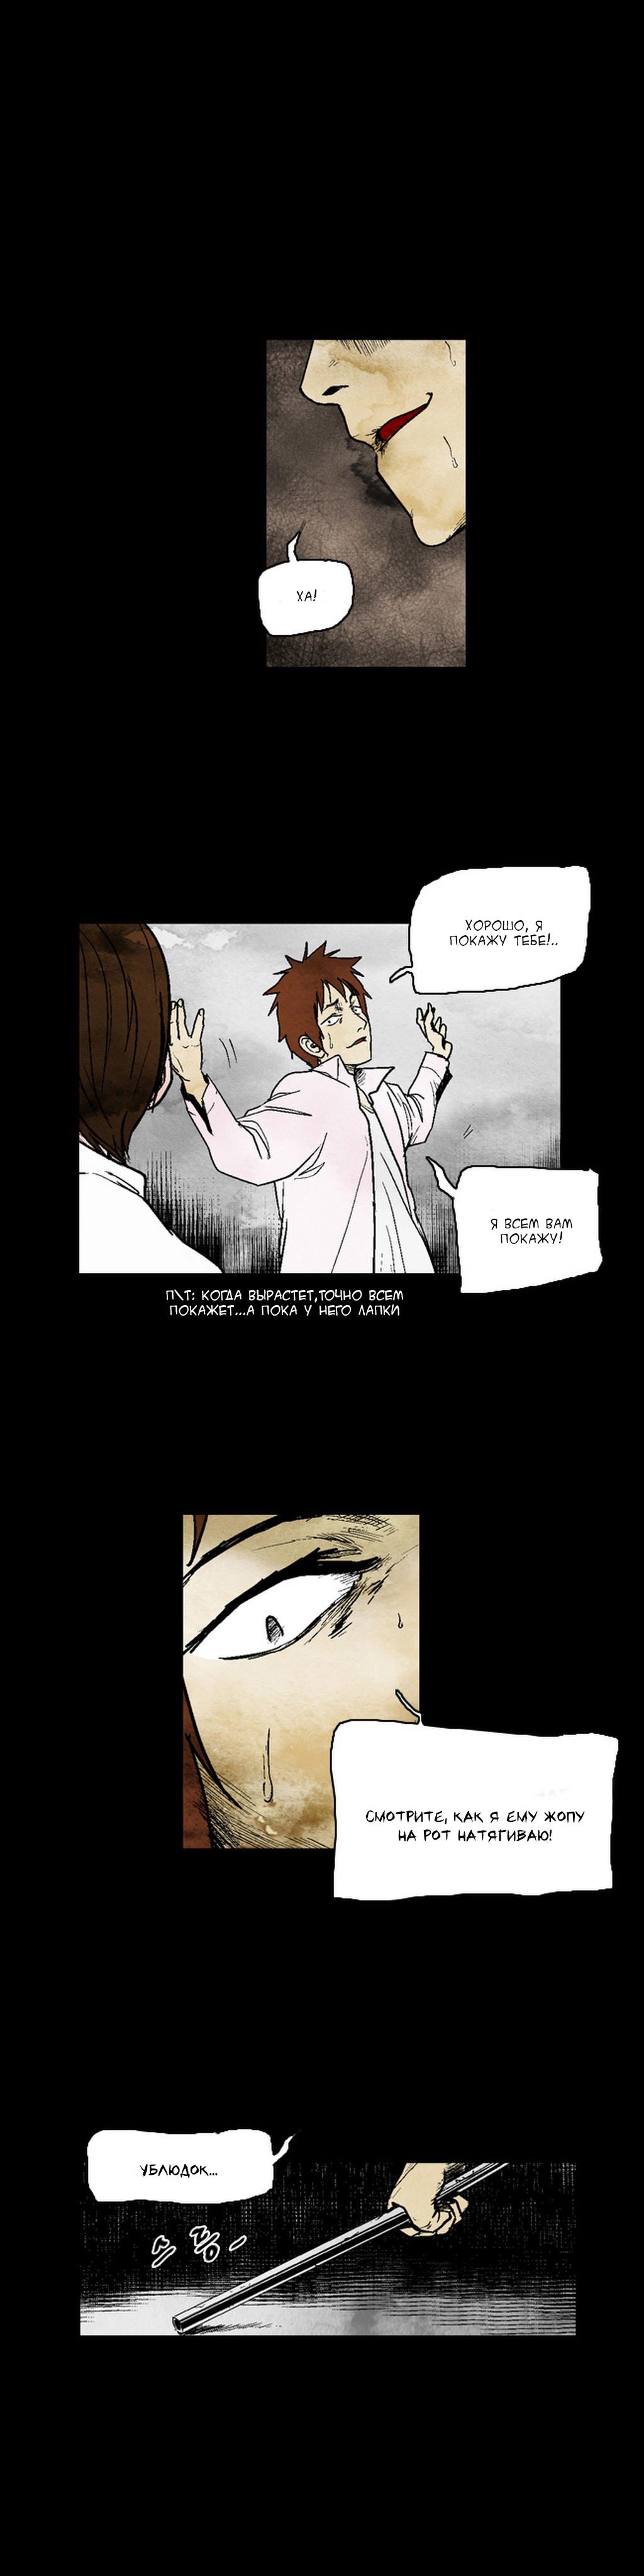 https://r1.ninemanga.com/comics/pic2/14/28302/409575/1519283760921.jpg Page 2